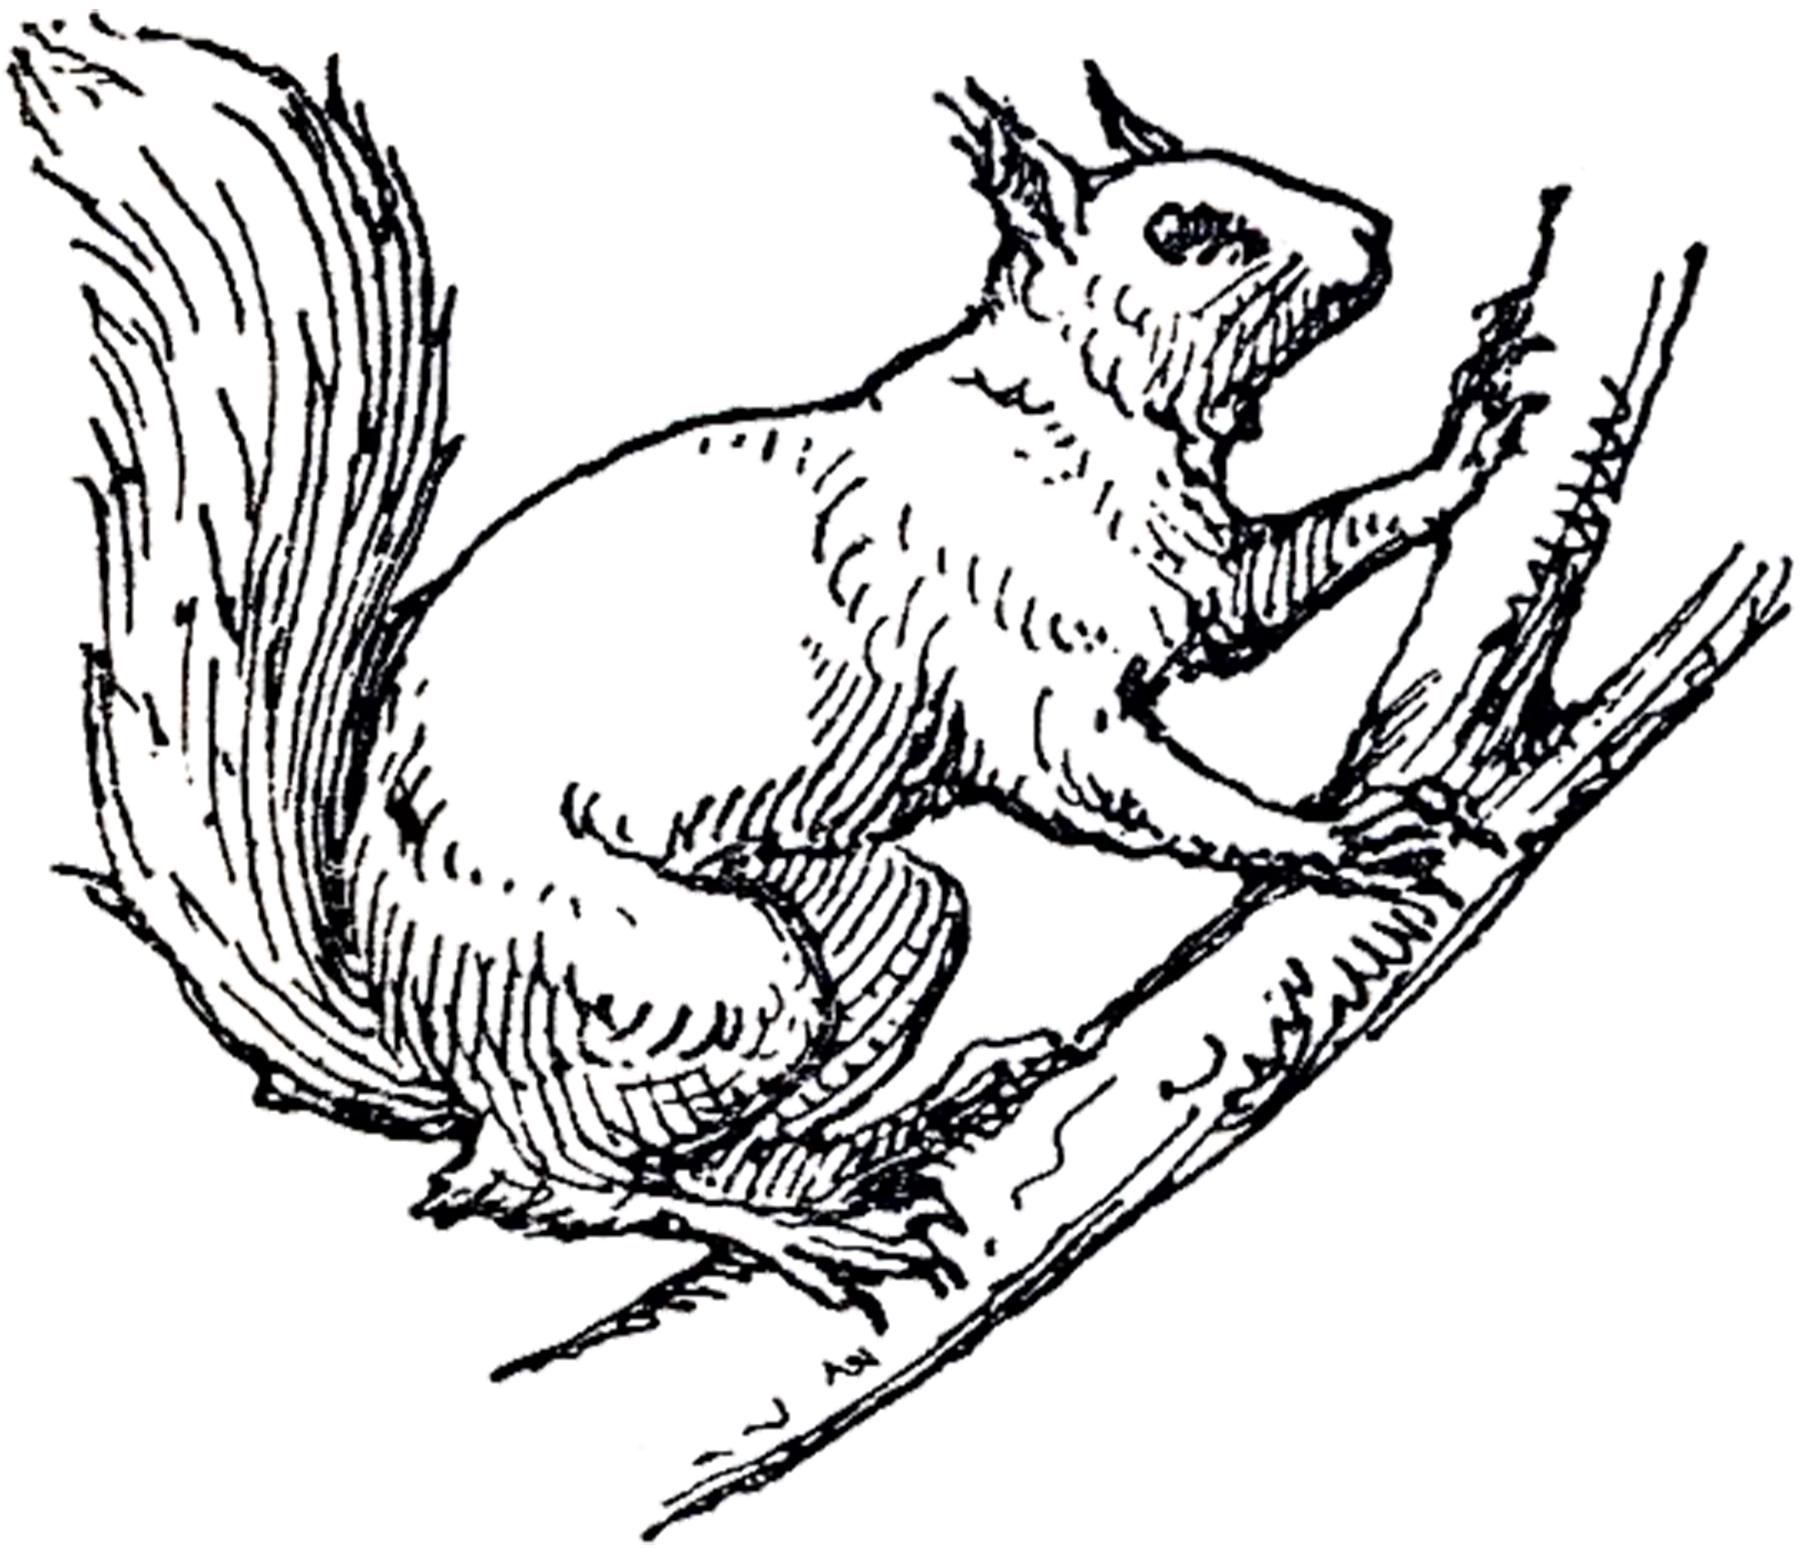 Vintage Squirrel Illustration